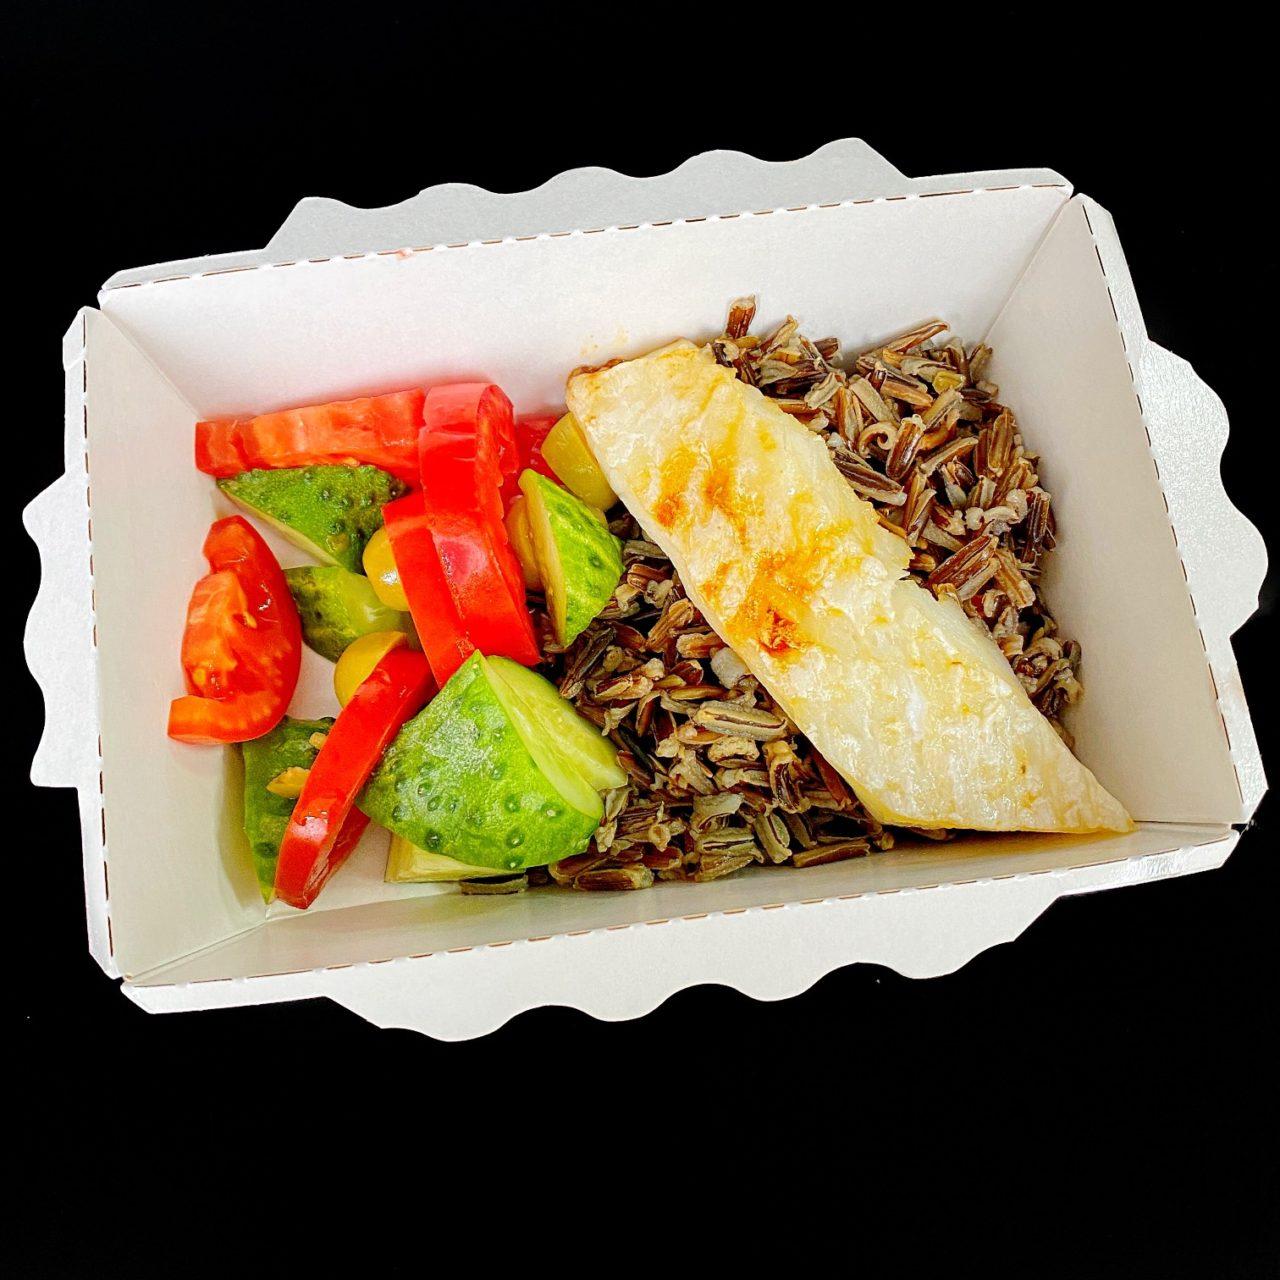 Рыба с диким рисом и овощами